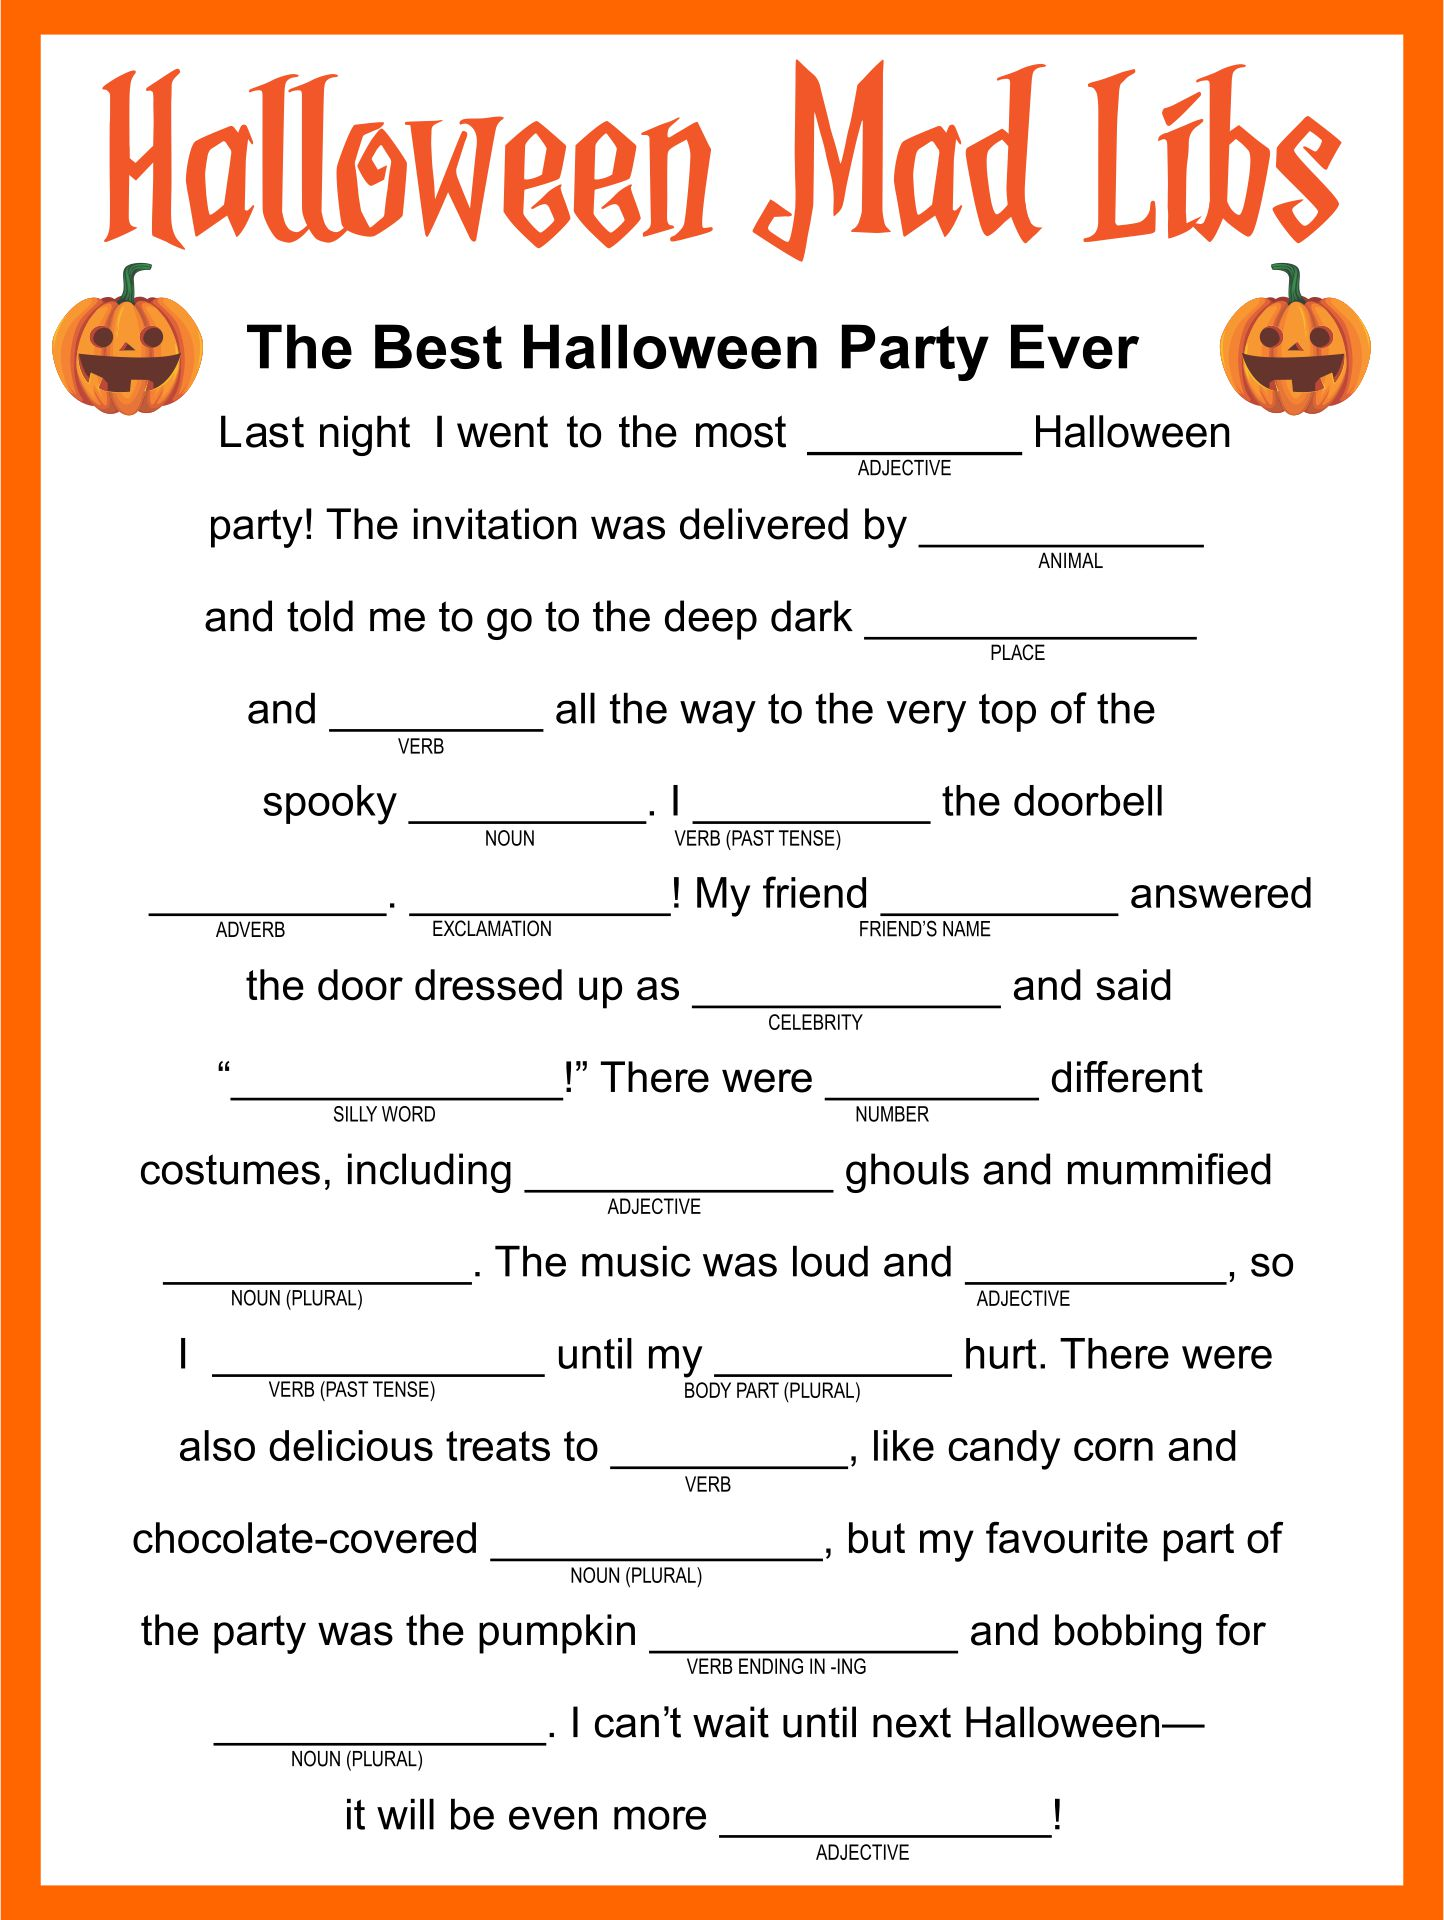 Halloween Mad Libs Printable Worksheets